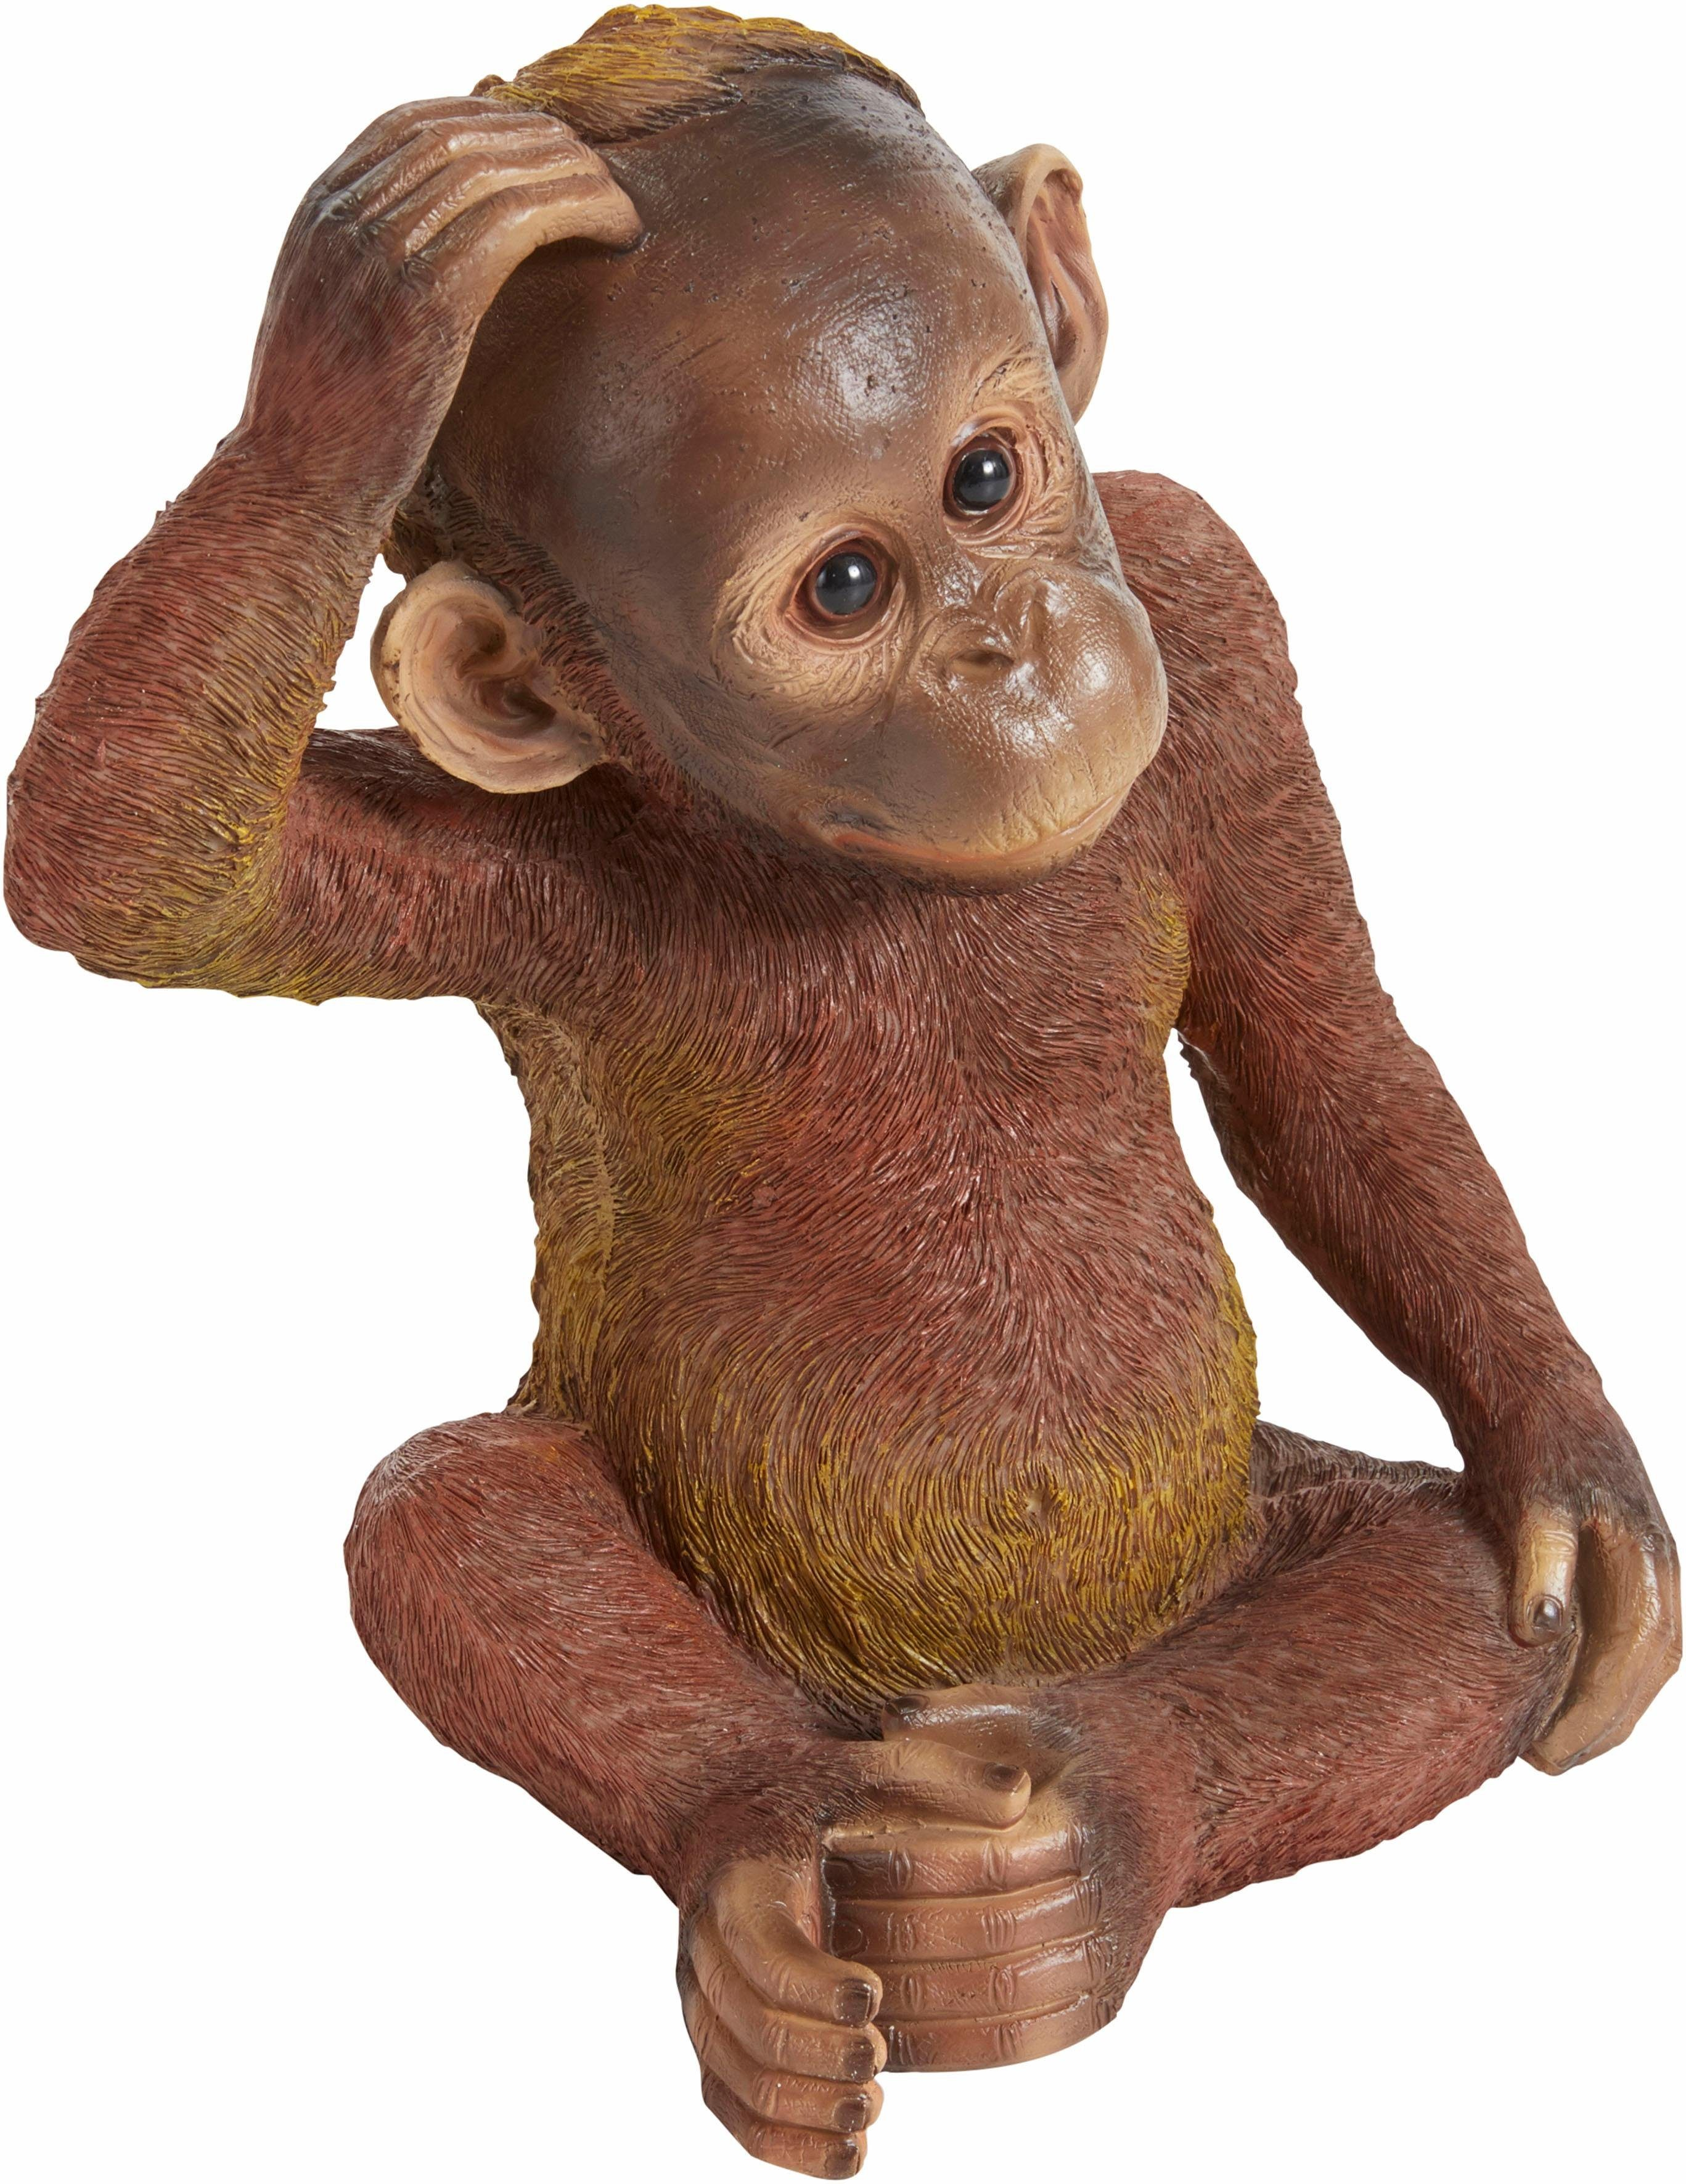 Home Affaire Dekofigur »Orangutan«, Home affaire